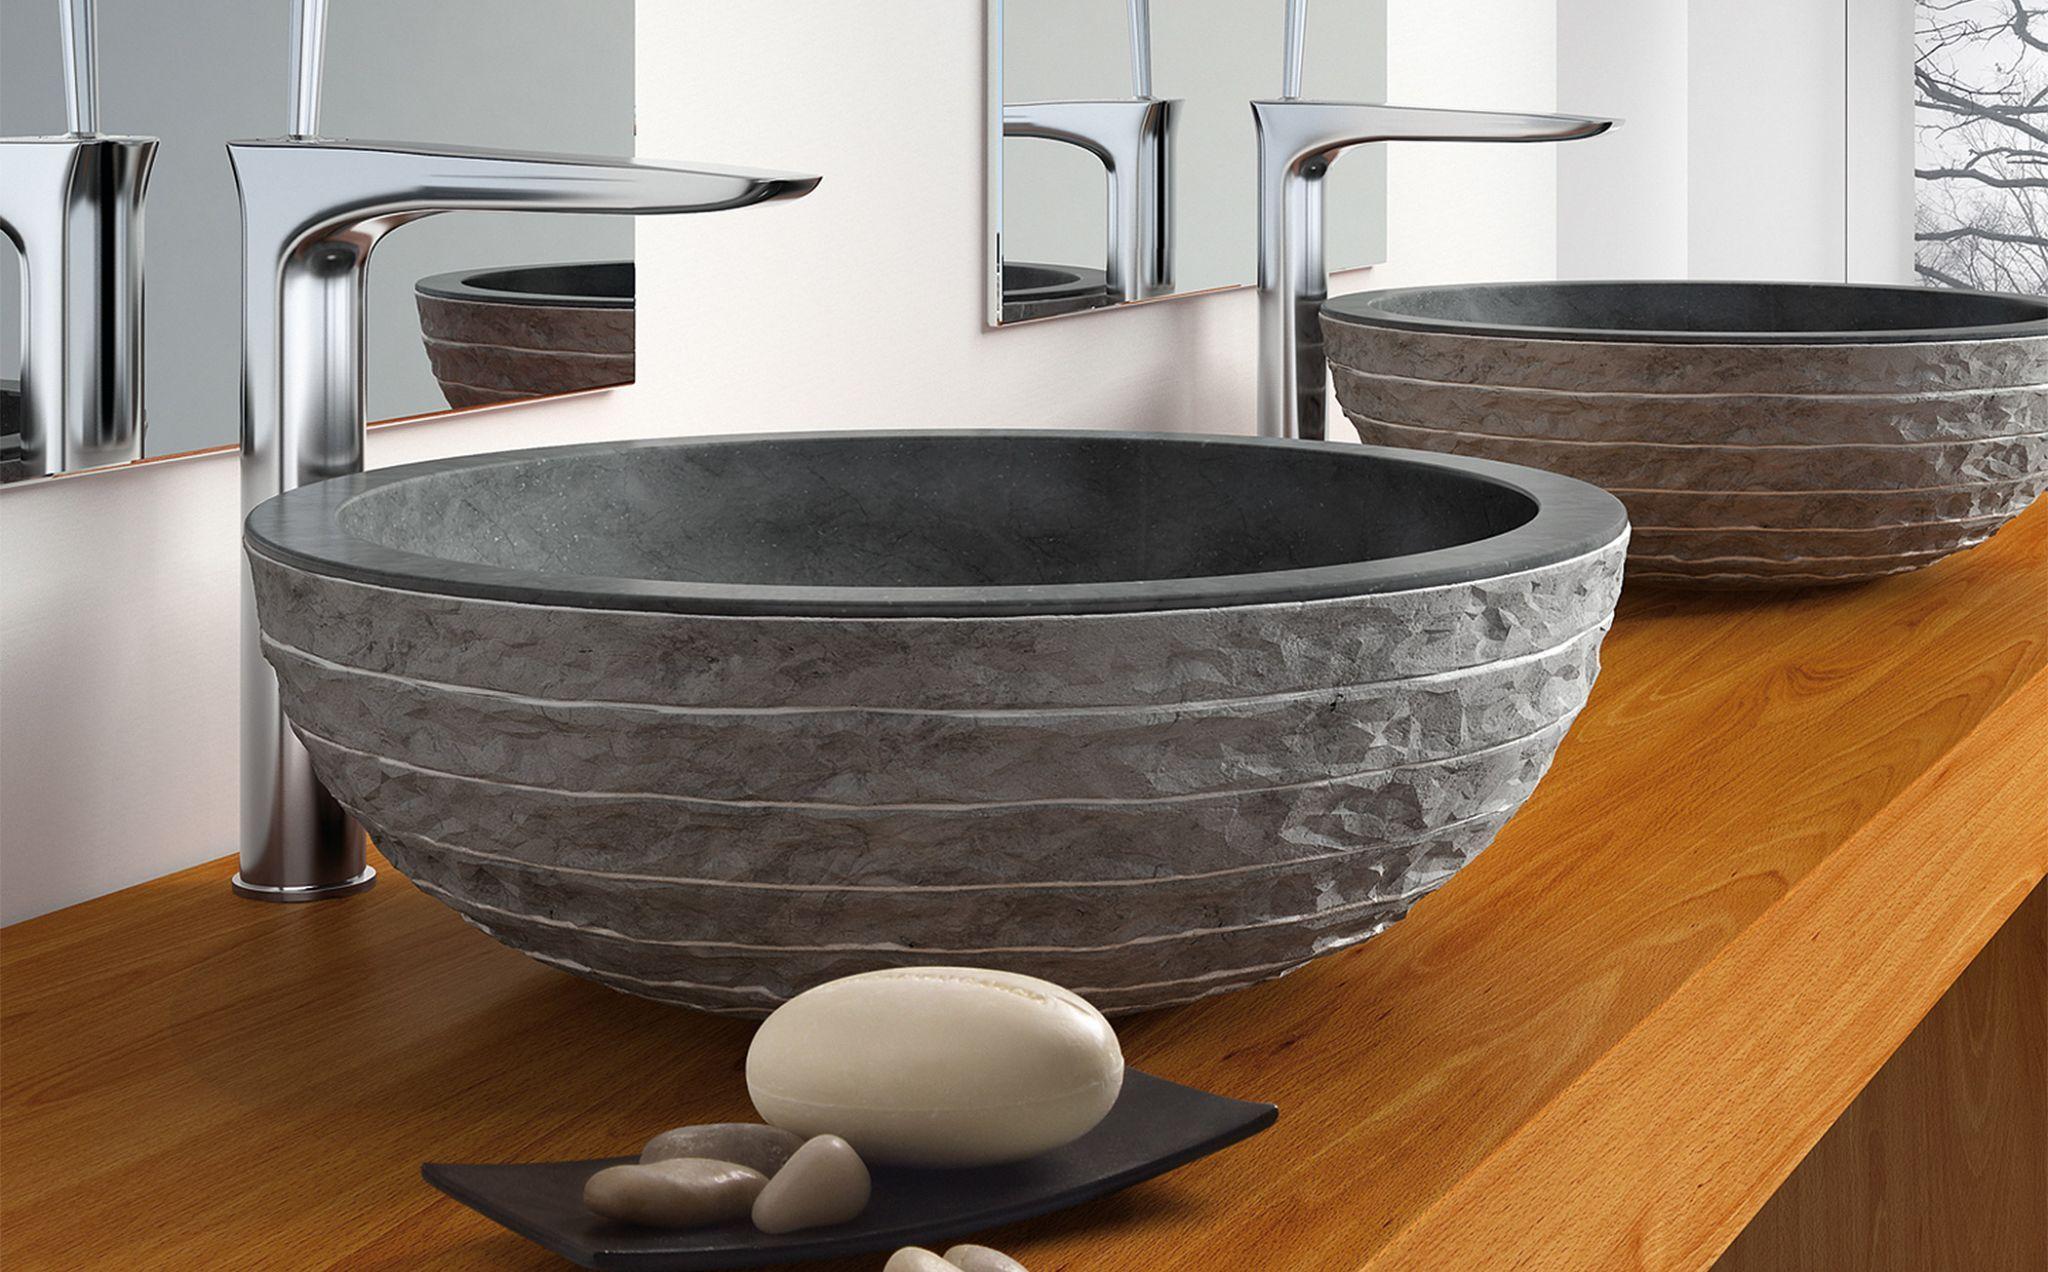 lavabo puket sobre encimera referencia negro referencia